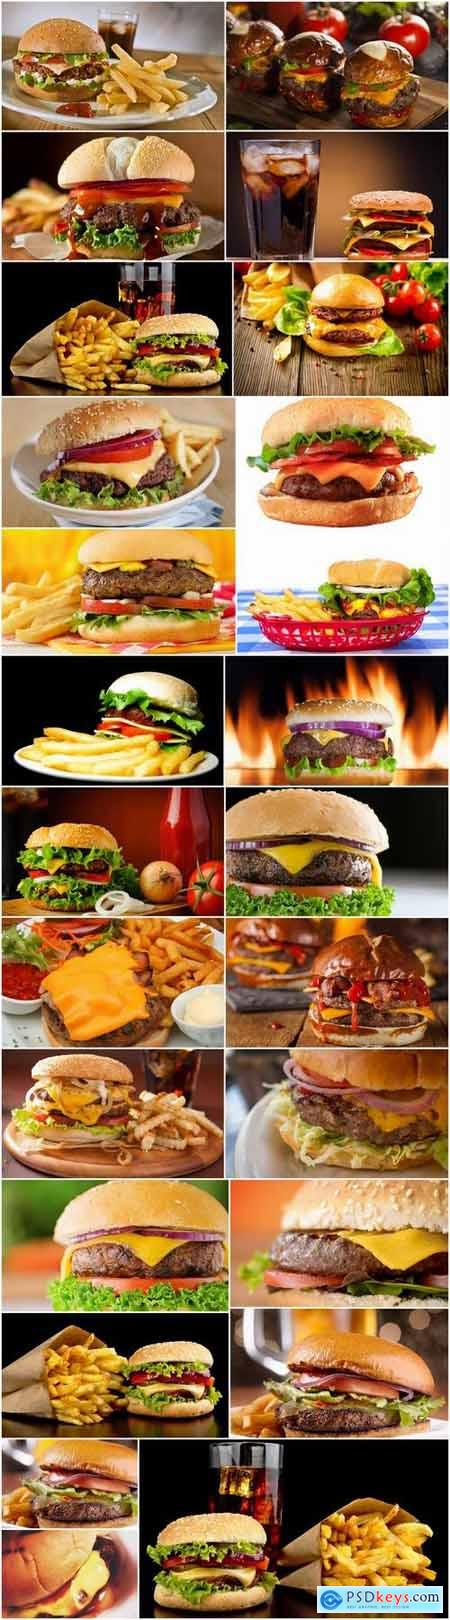 Cheeseburger fast food hamburger sandwich 25 HQ Jpeg